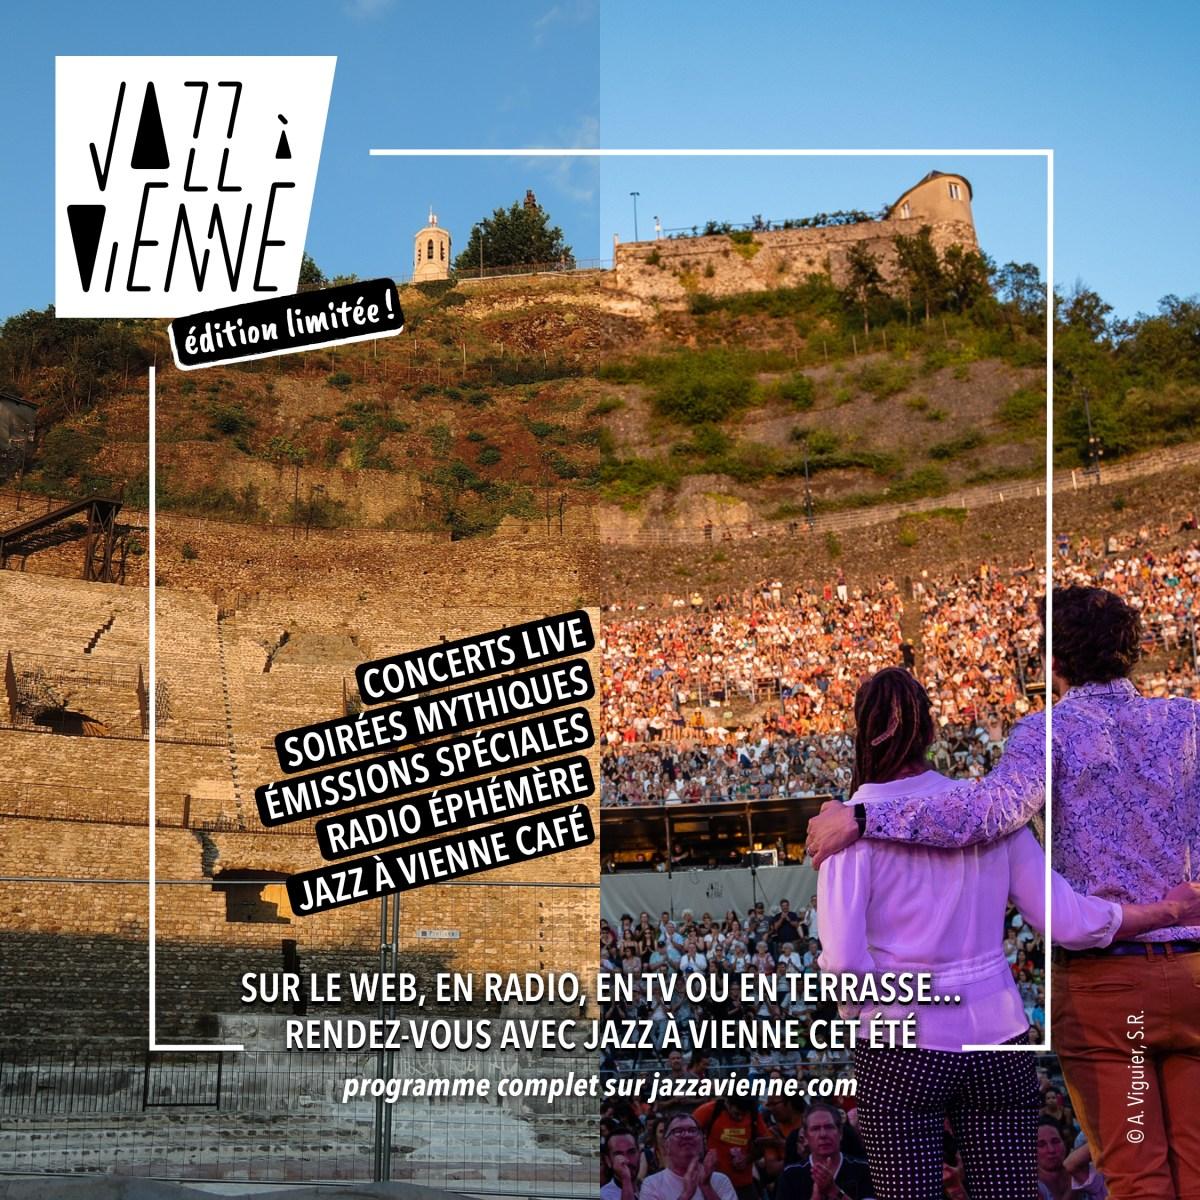 jazz a vienne edition limitée